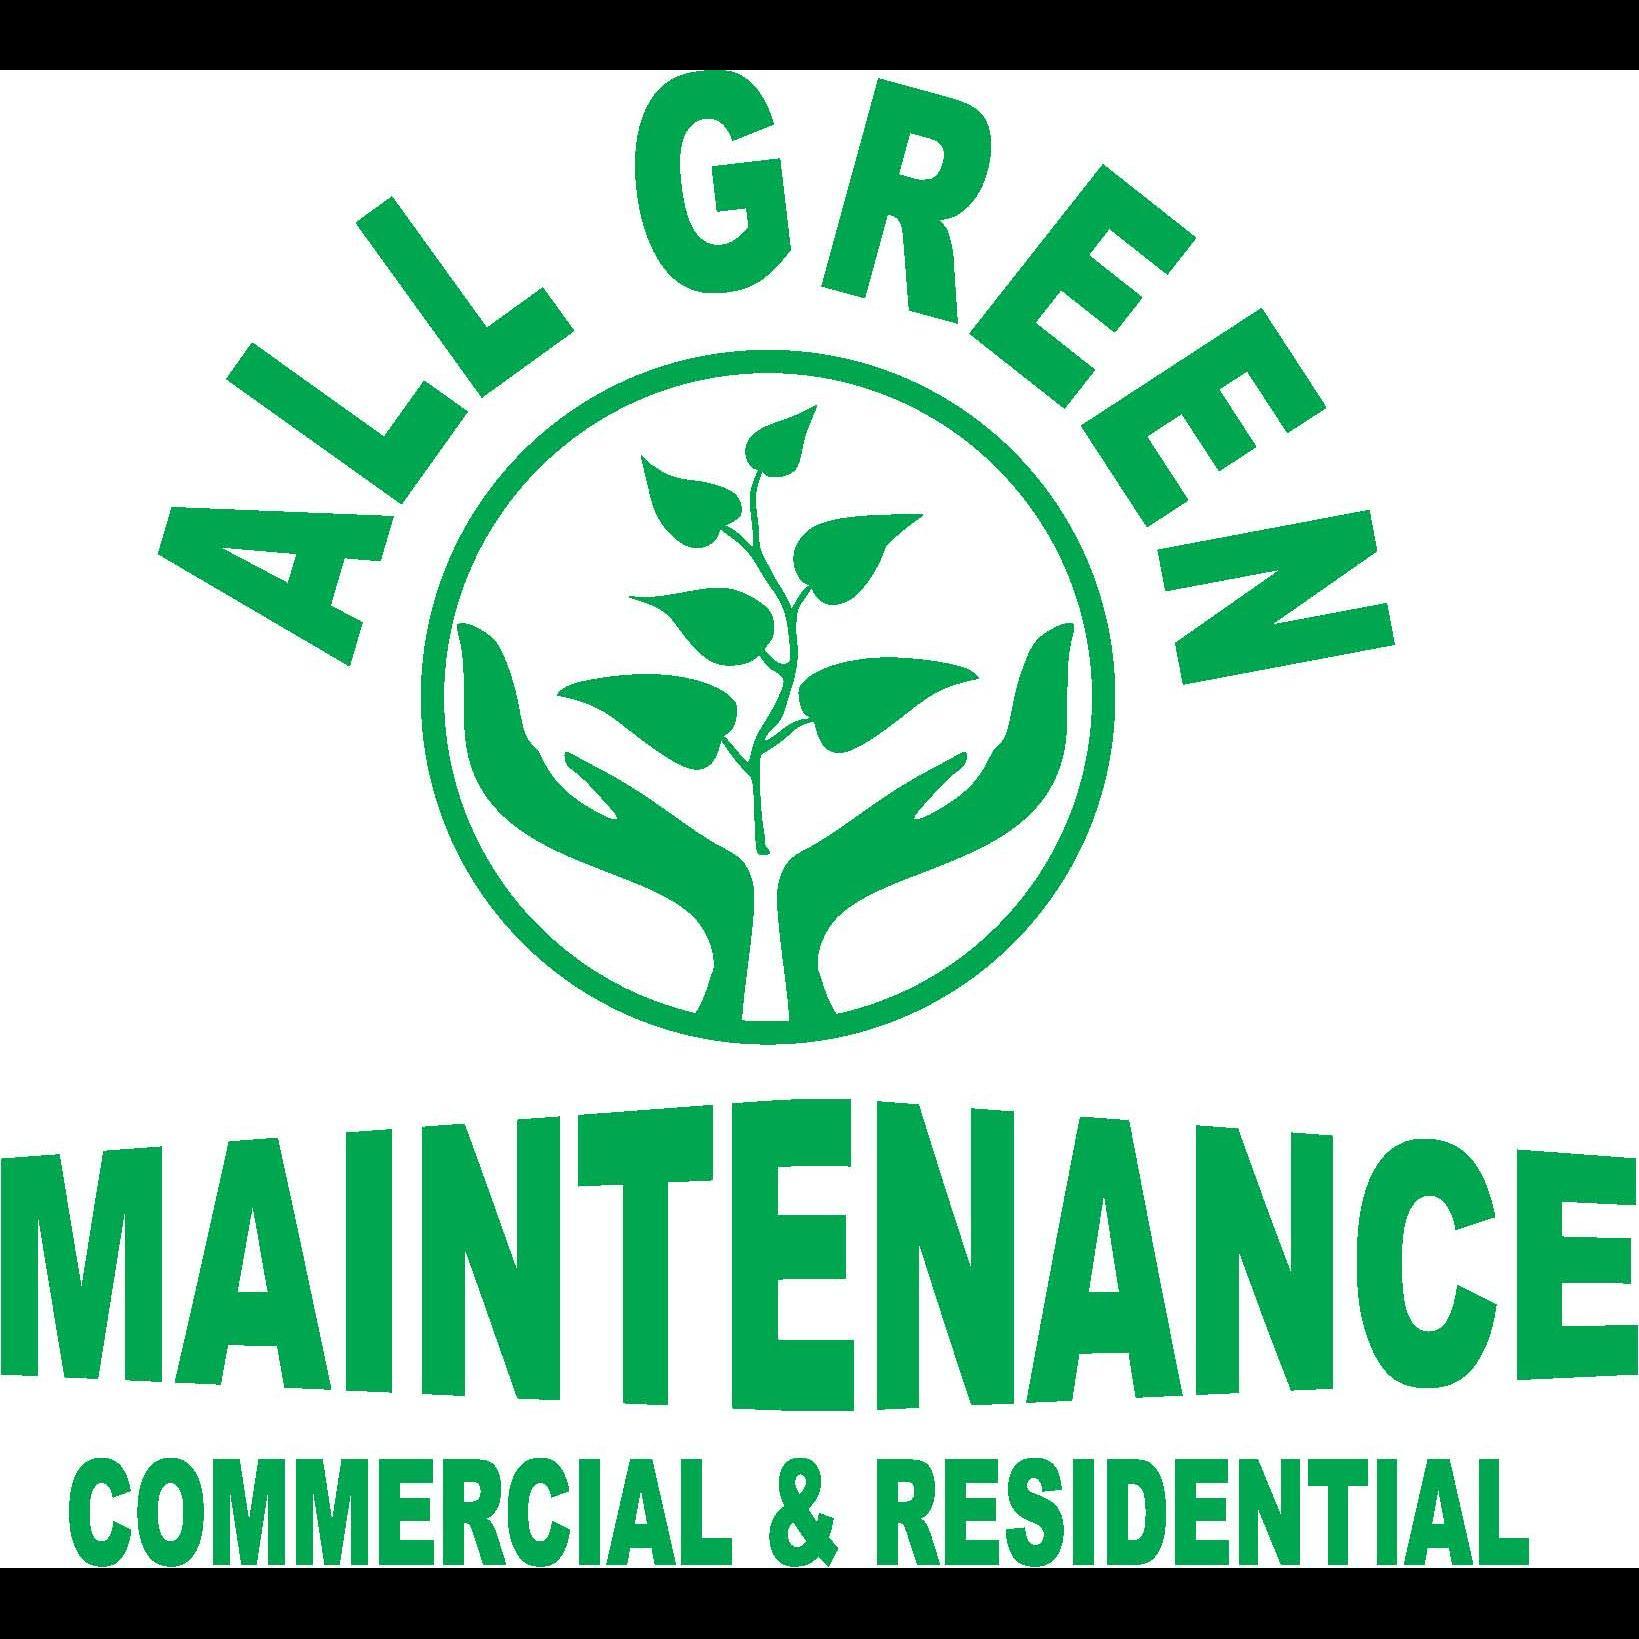 All Green Maintenance image 2